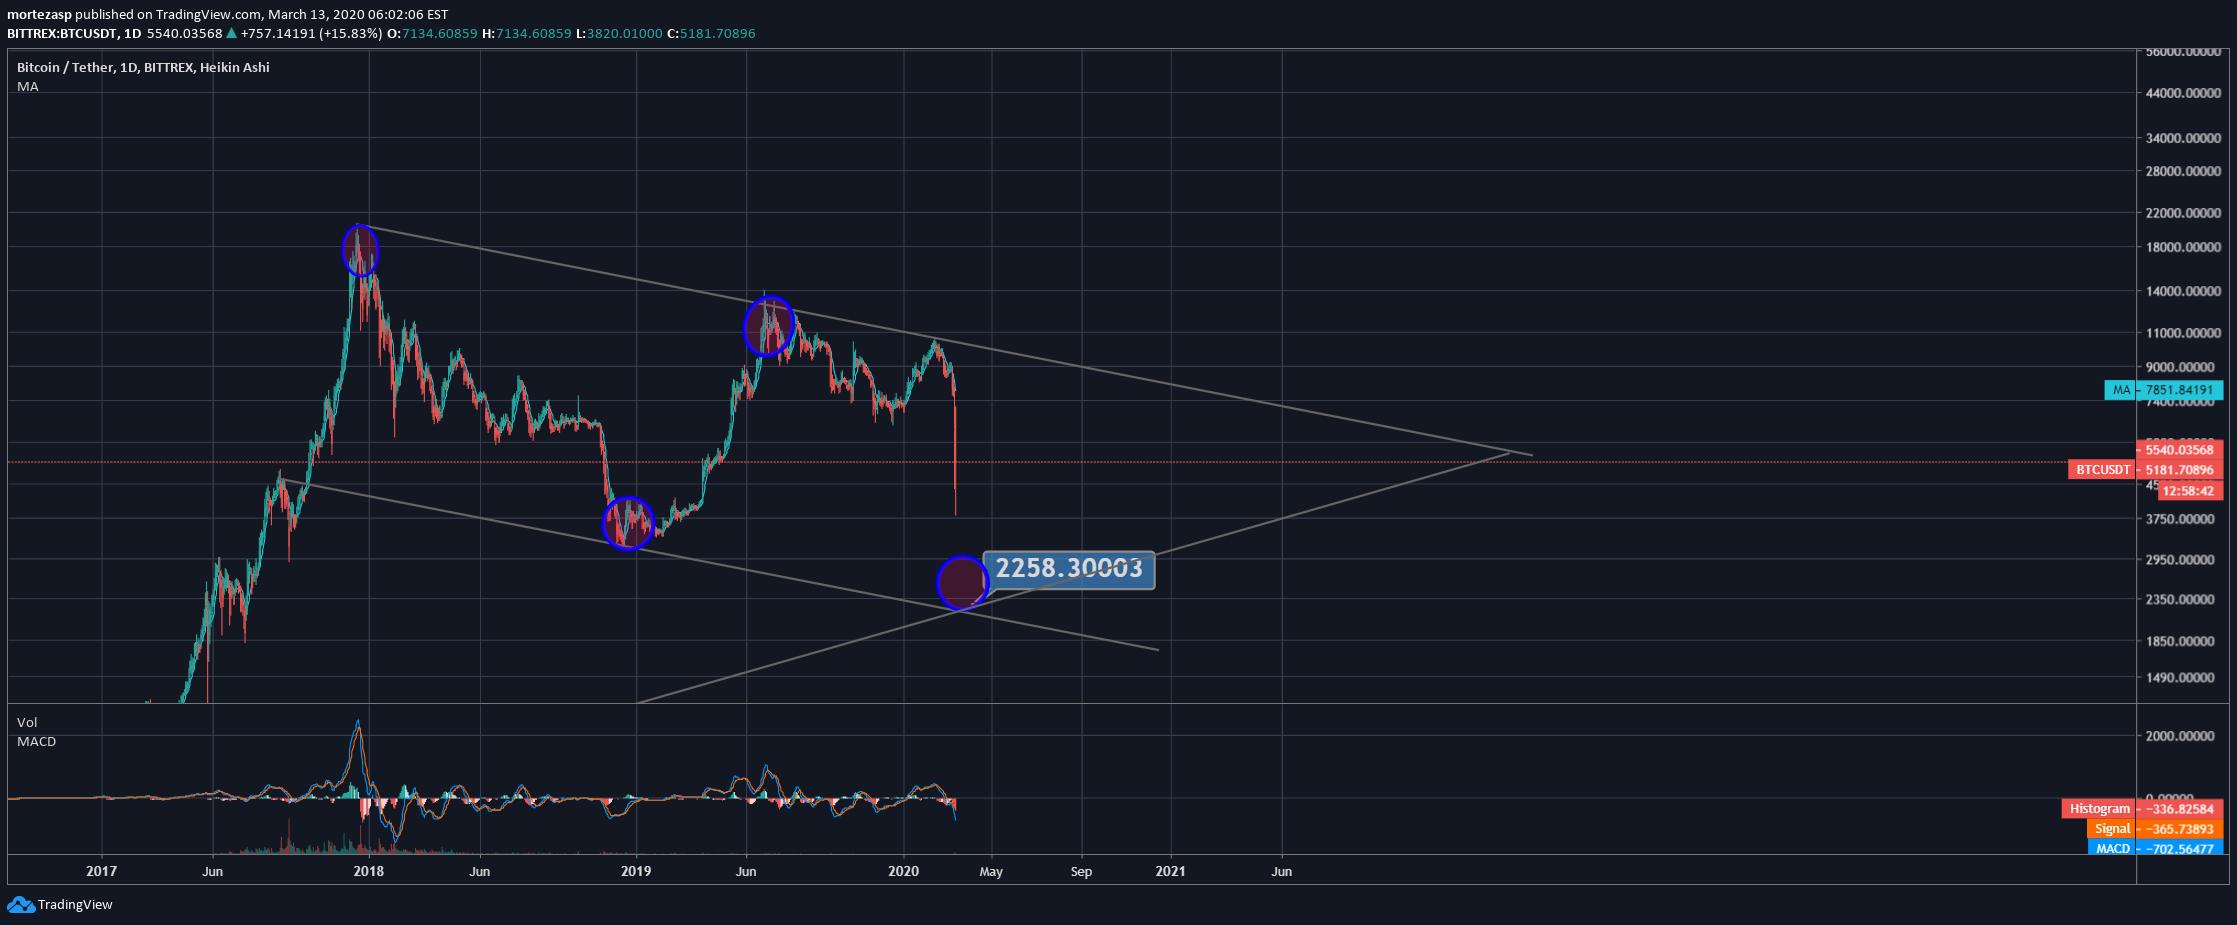 cfd broker im test avatrade testbericht tradingview btc usdt bittrex